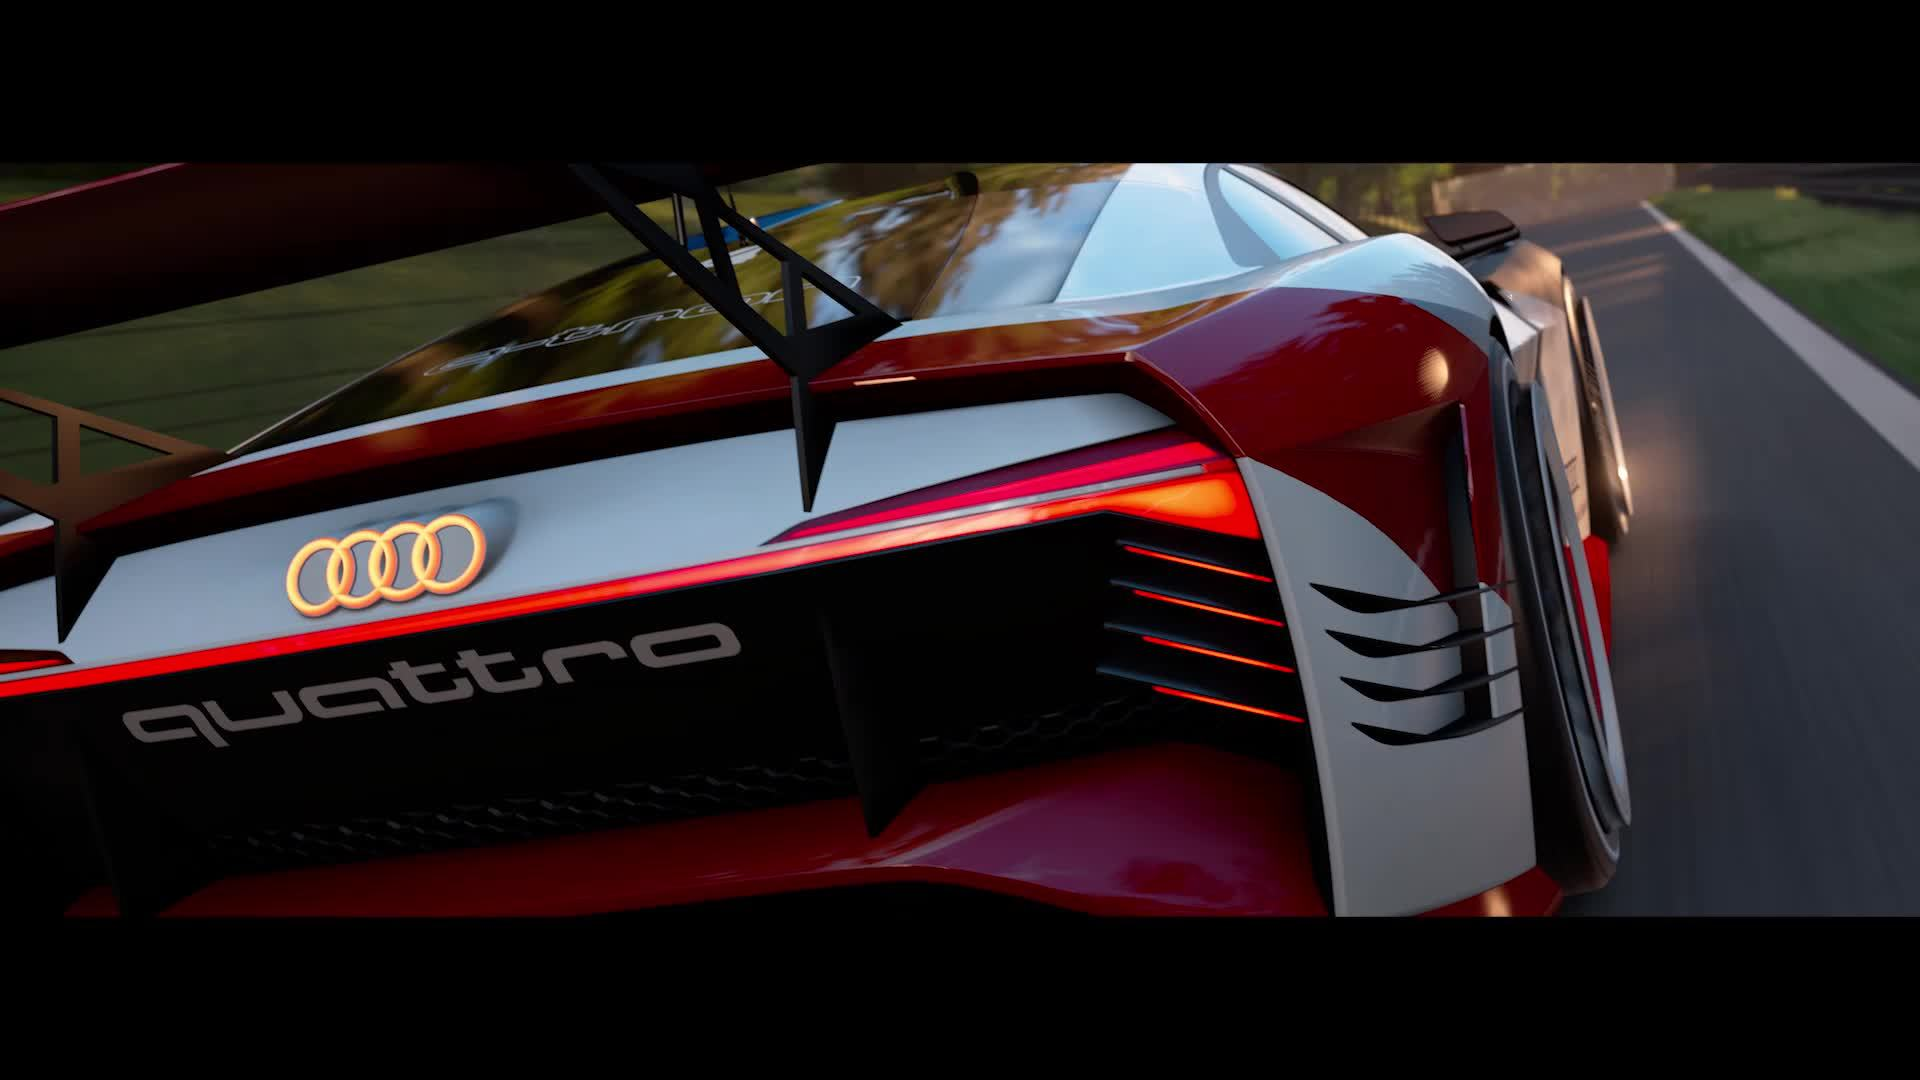 The real deal: Audi e-tron Vision Gran Turismo